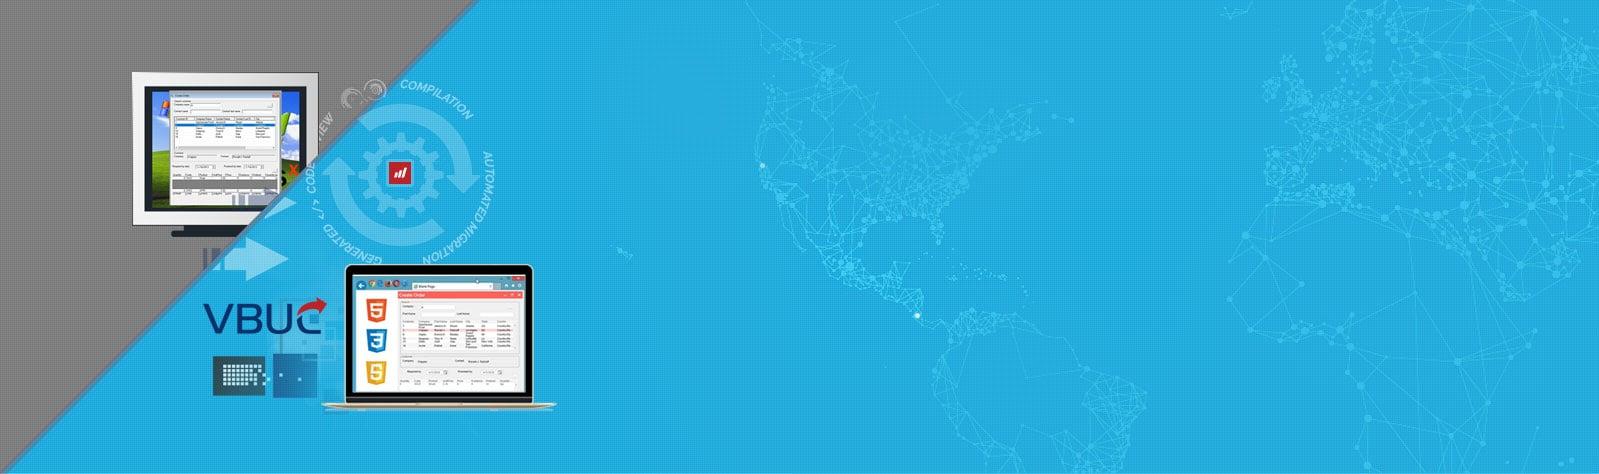 vbuc-map.jpg